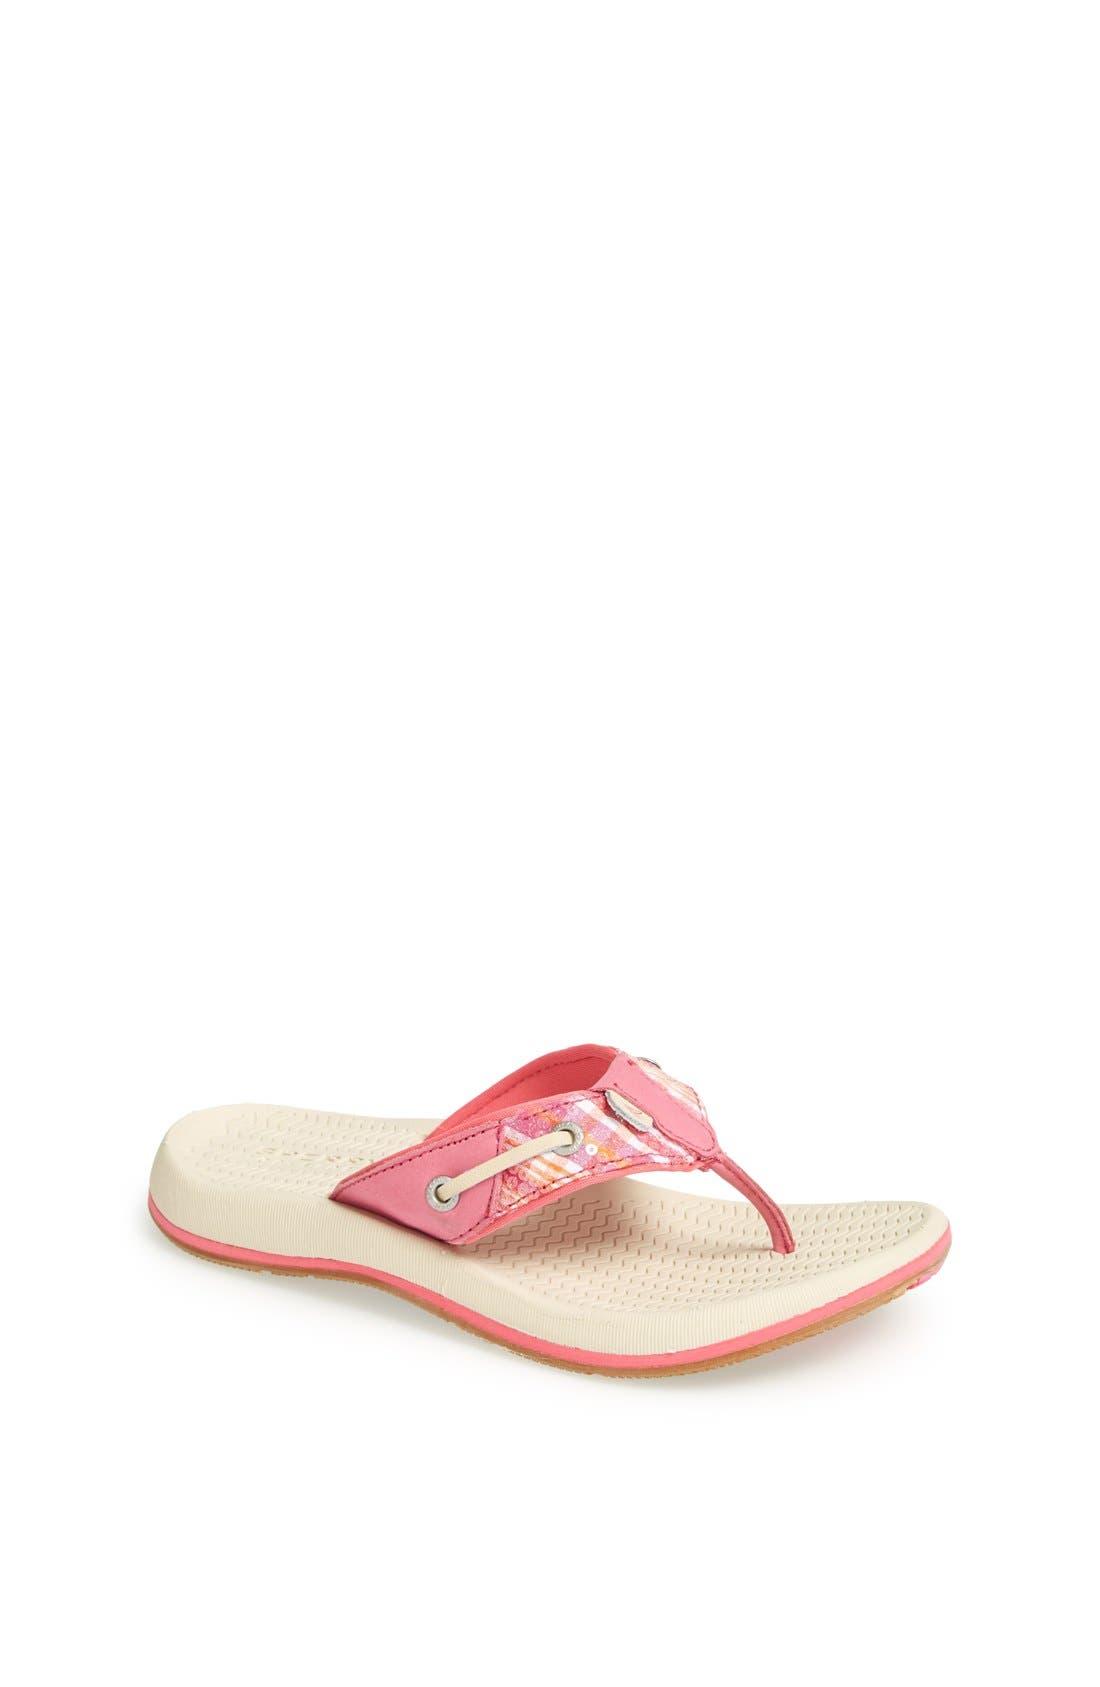 Main Image - Sperry Top-Sider® Kids 'Seafish' Sandal (Toddler, Little Kid & Big Kid)